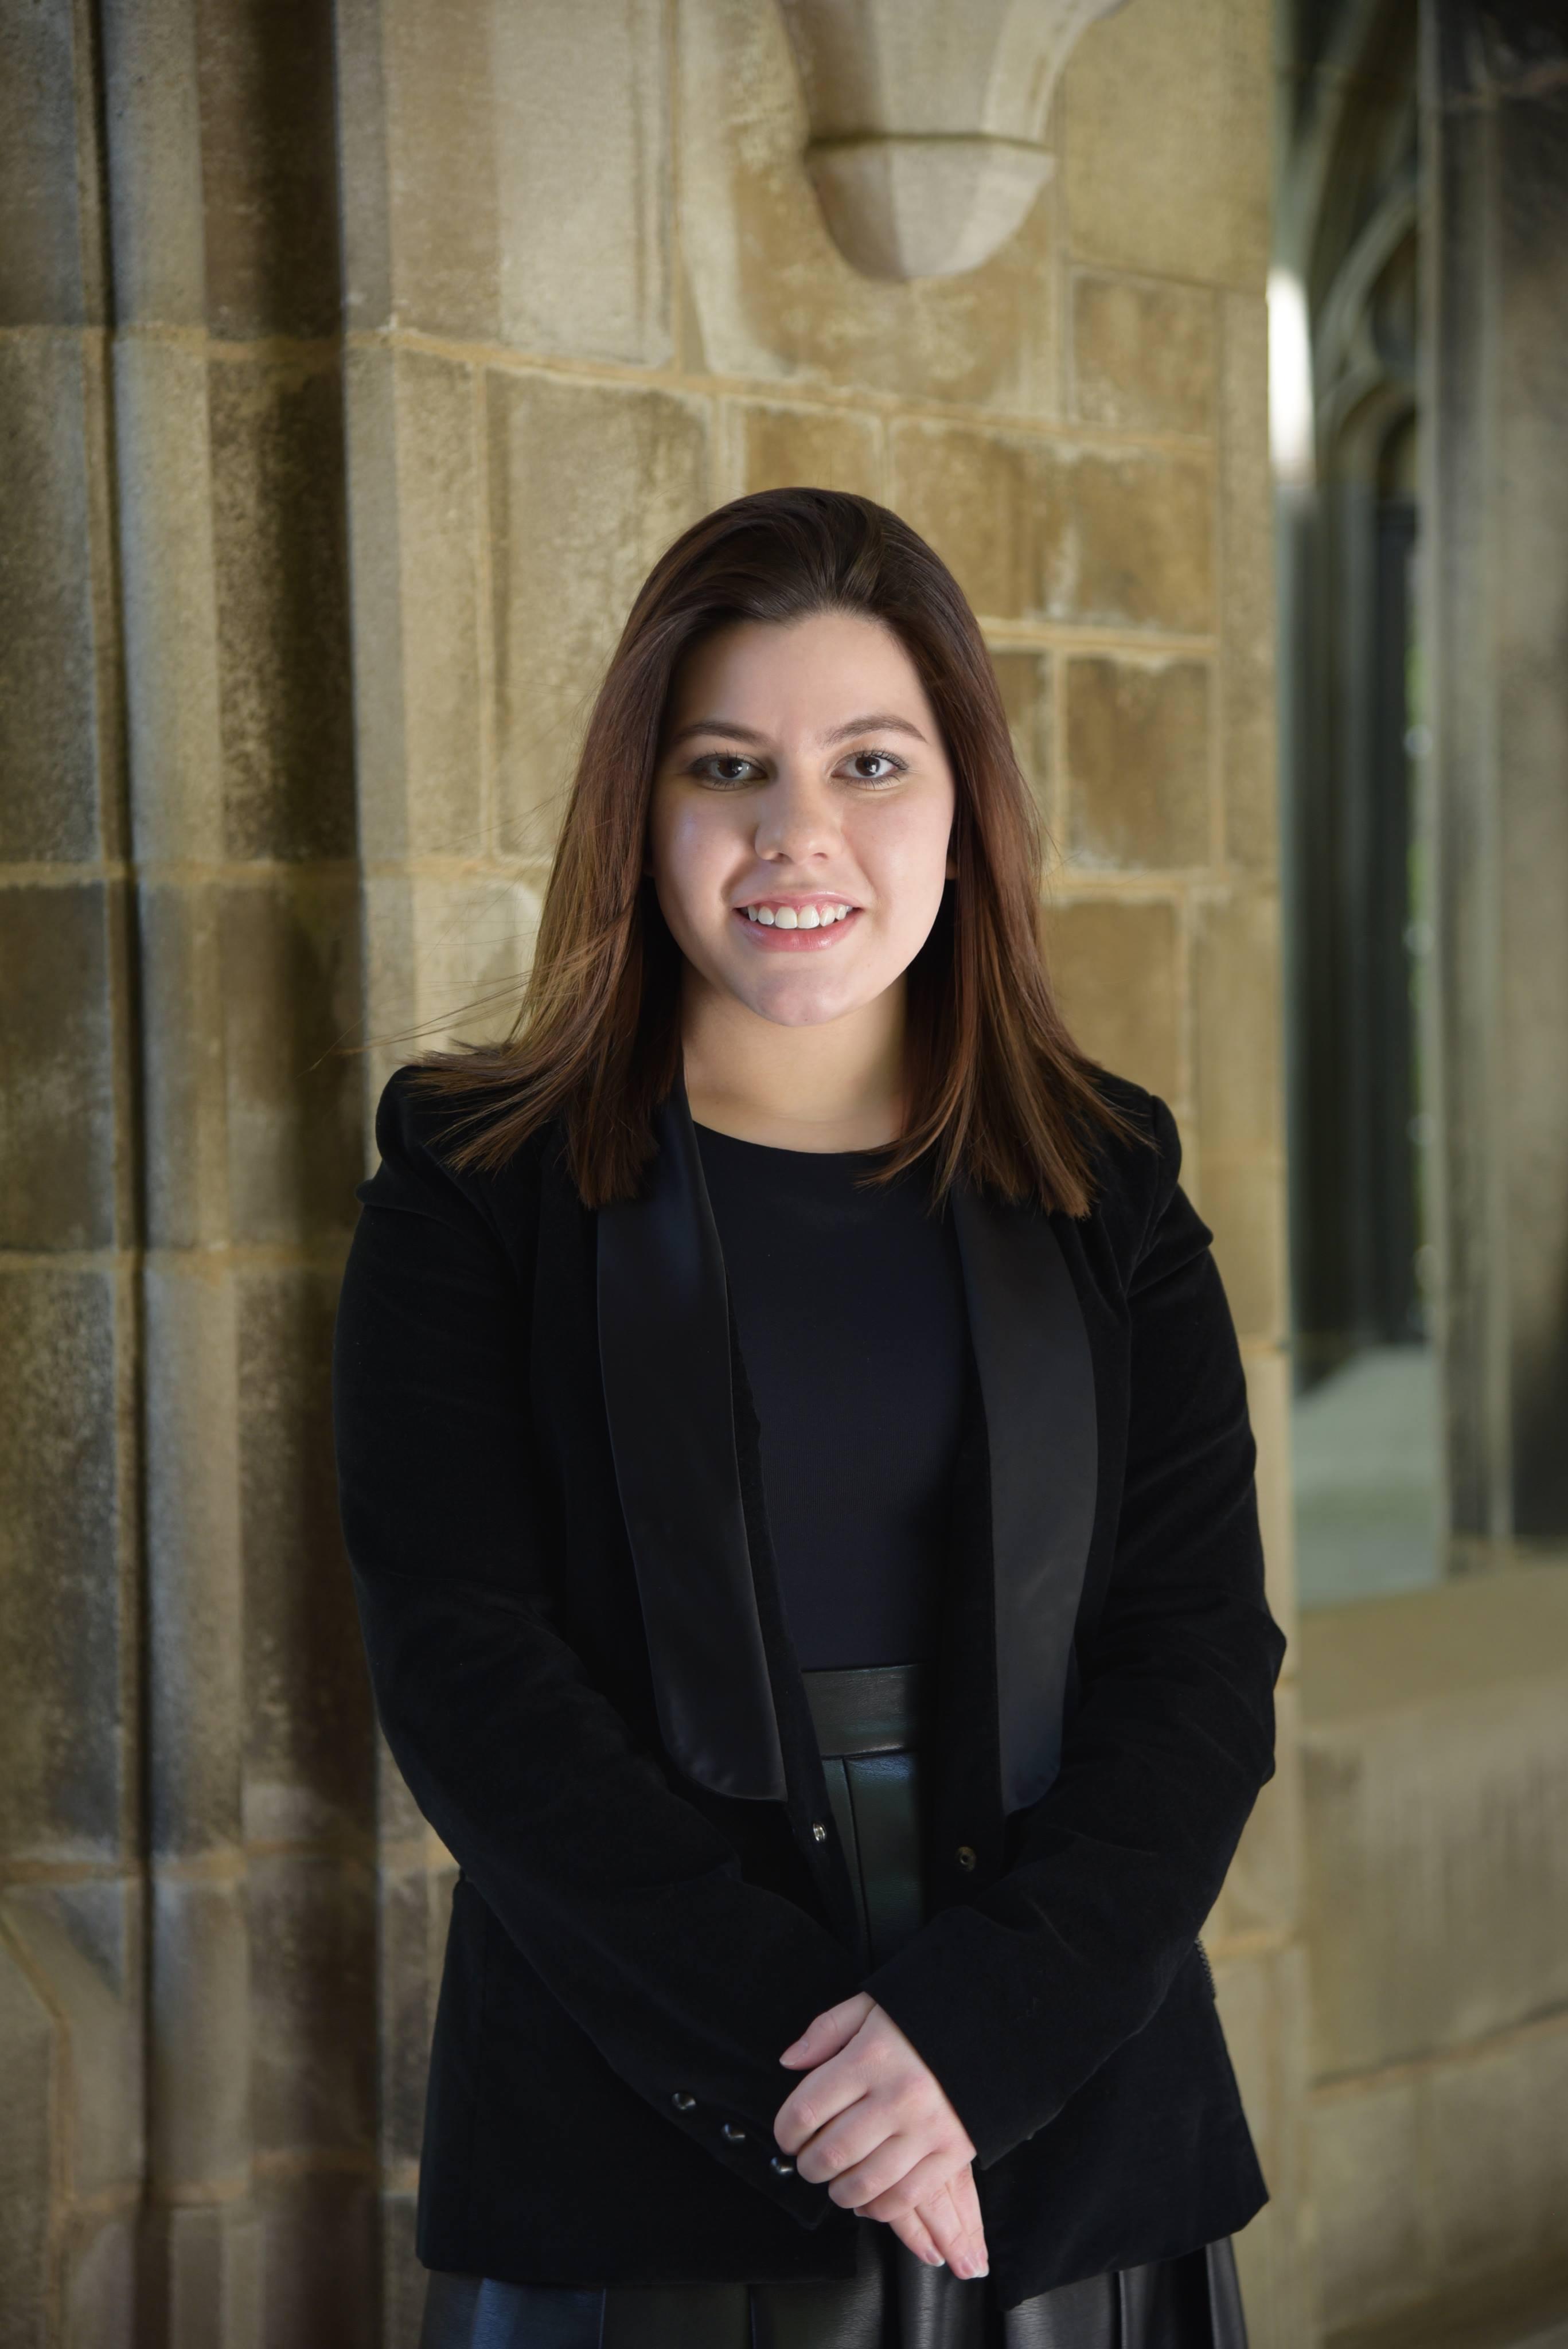 Ms. Isabel Álvarez (she/her)